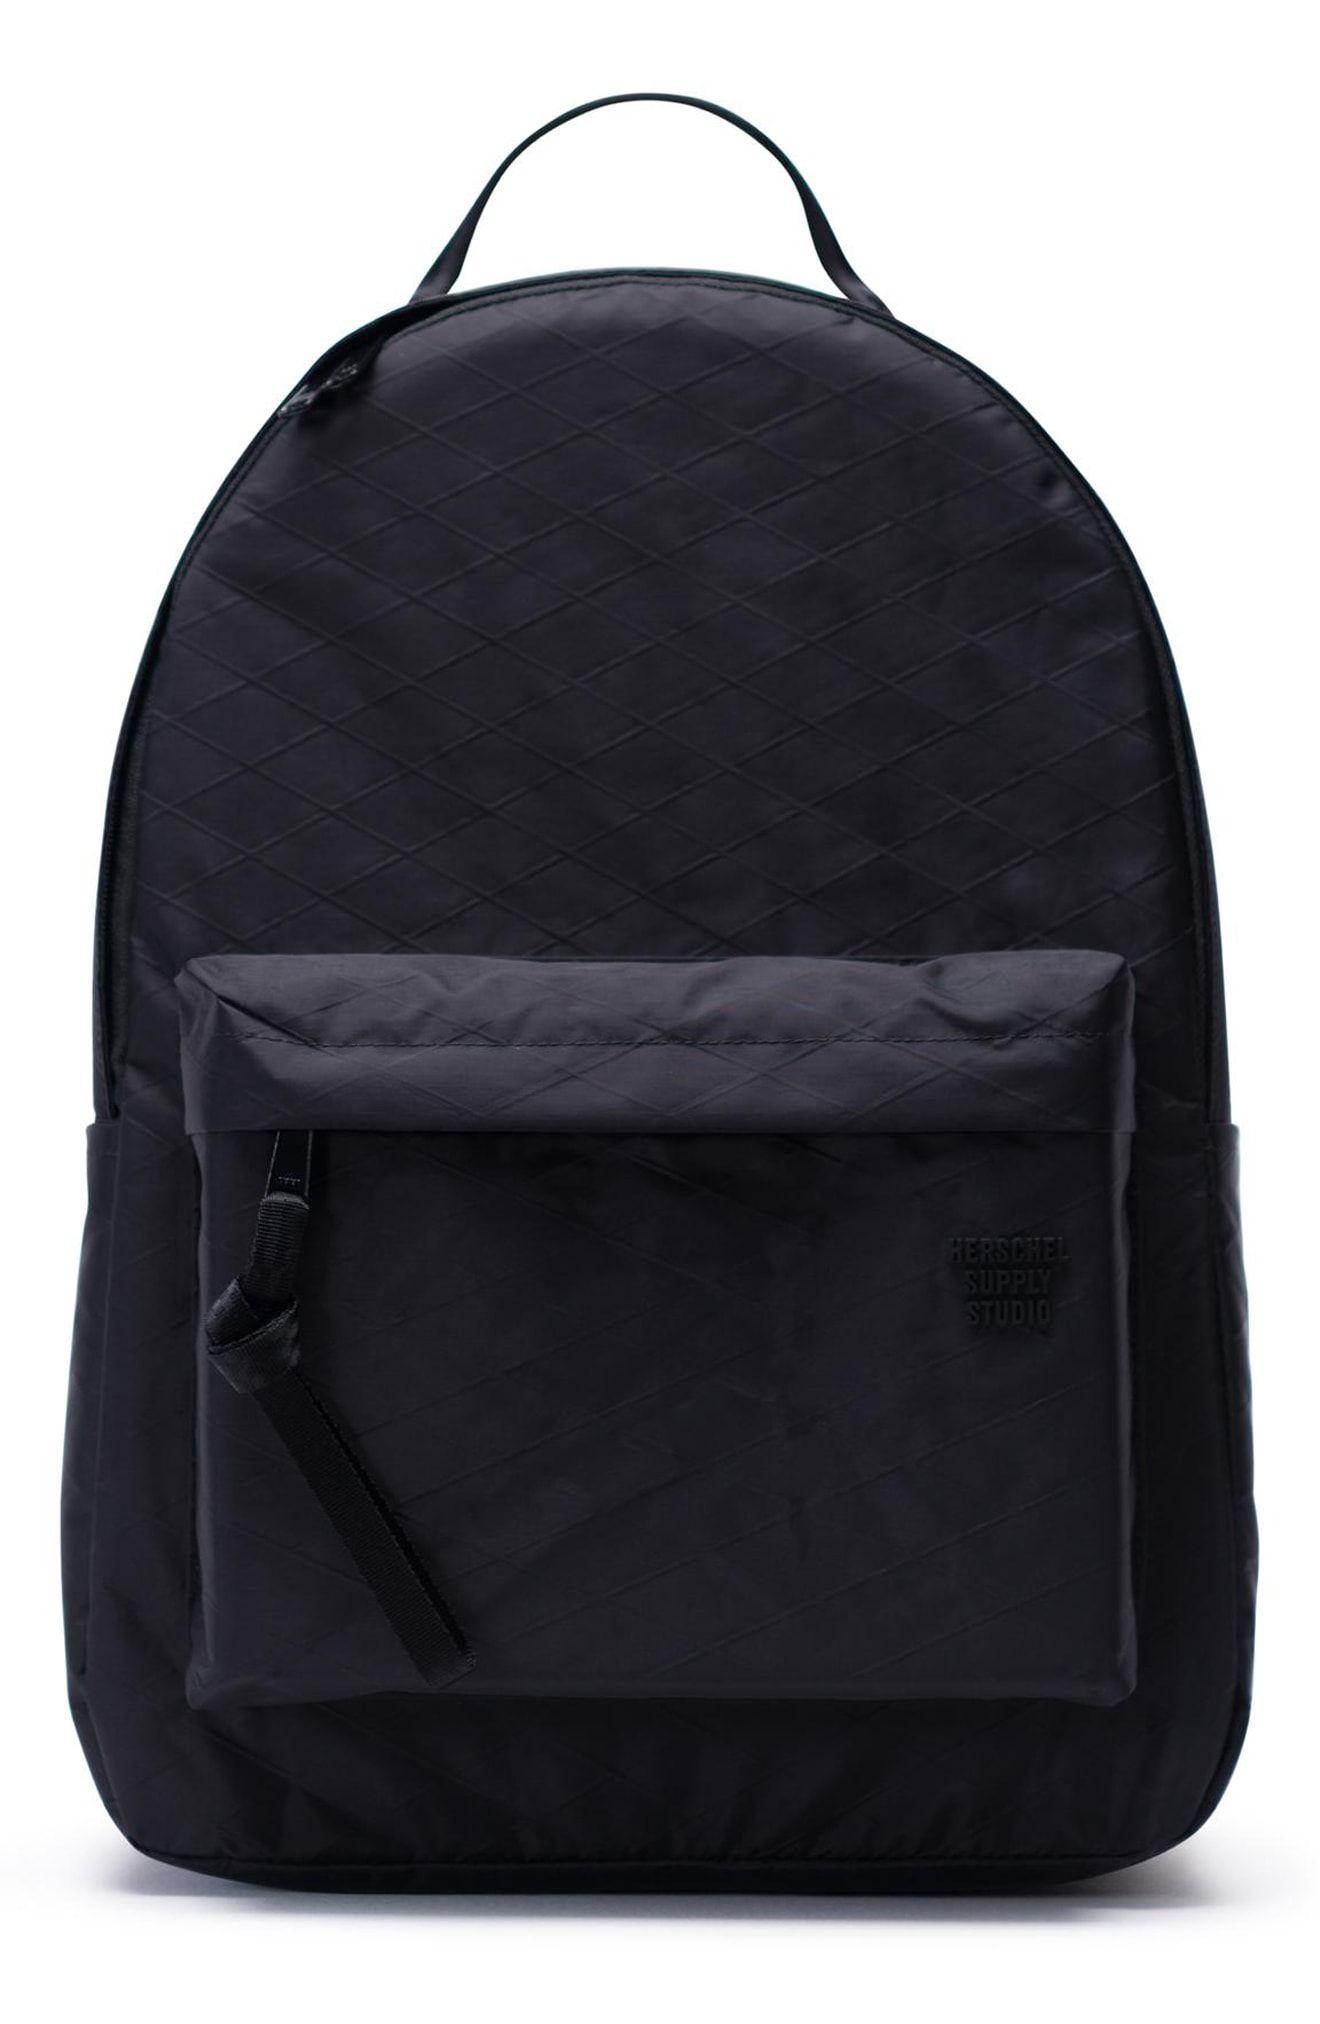 760b55ff9b HERSCHEL SUPPLY CO. CLASSIC X-LARGE STUDIO COLLECTION BACKPACK - BLACK.   herschelsupplyco.  bags  nylon  backpacks